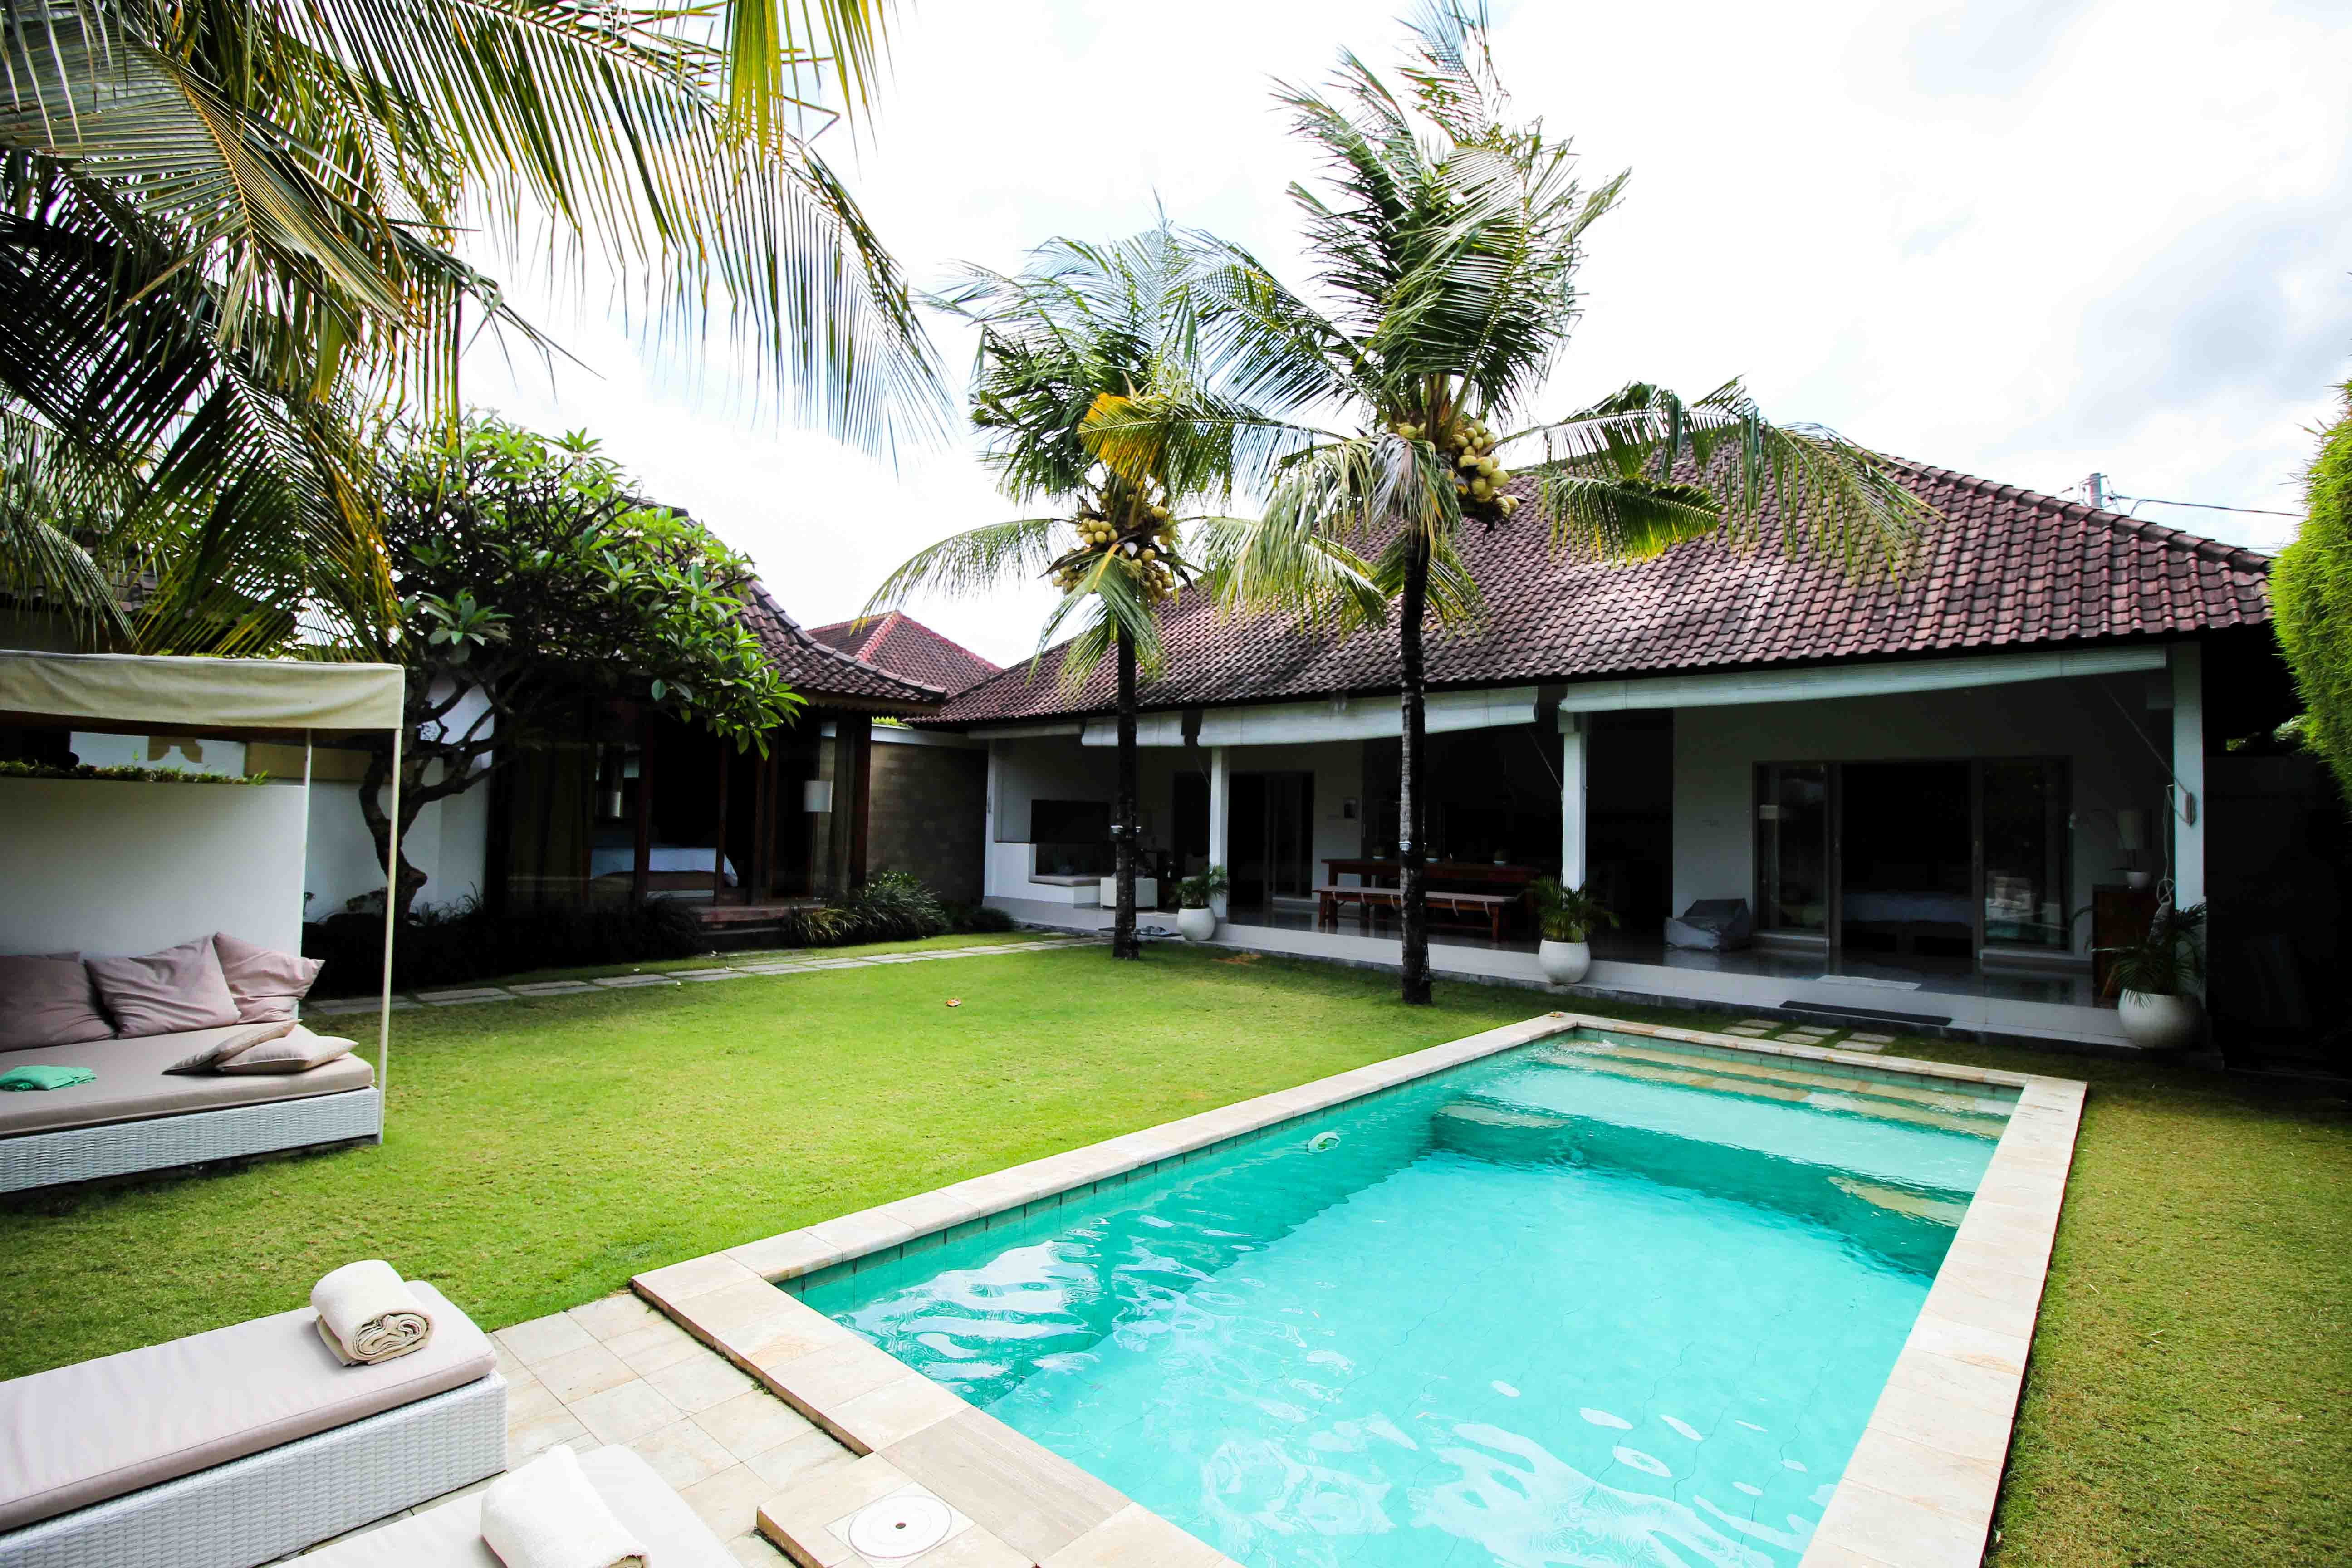 Sahana Villas Seminyak Poolvilla 3 Bedroom Seminyak Bali Luxusvilla mieten privater Pool Reiseblogger